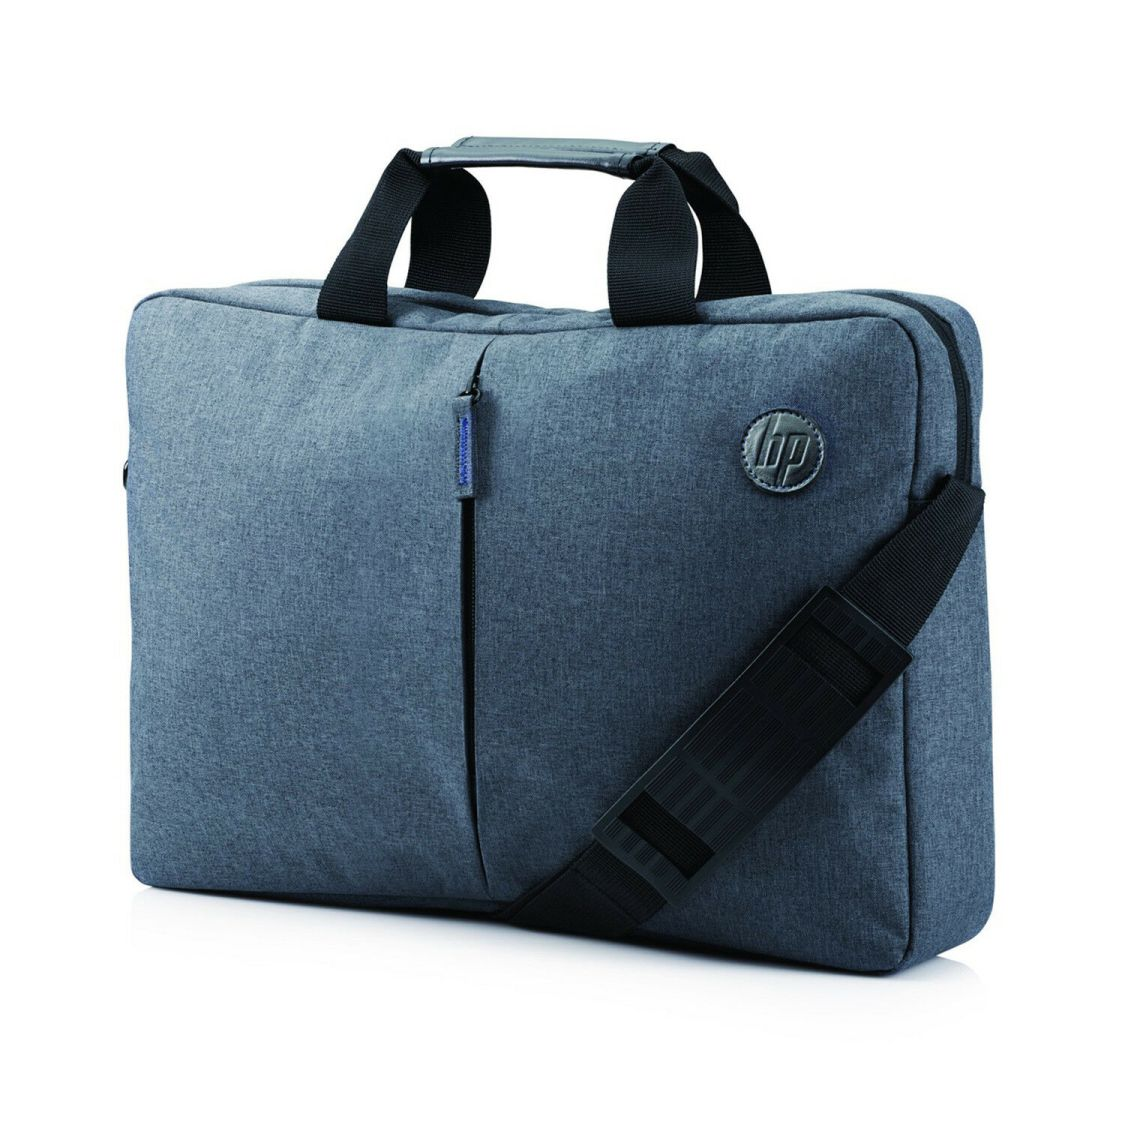 Notebooktasche HP Value Top Load 15,6